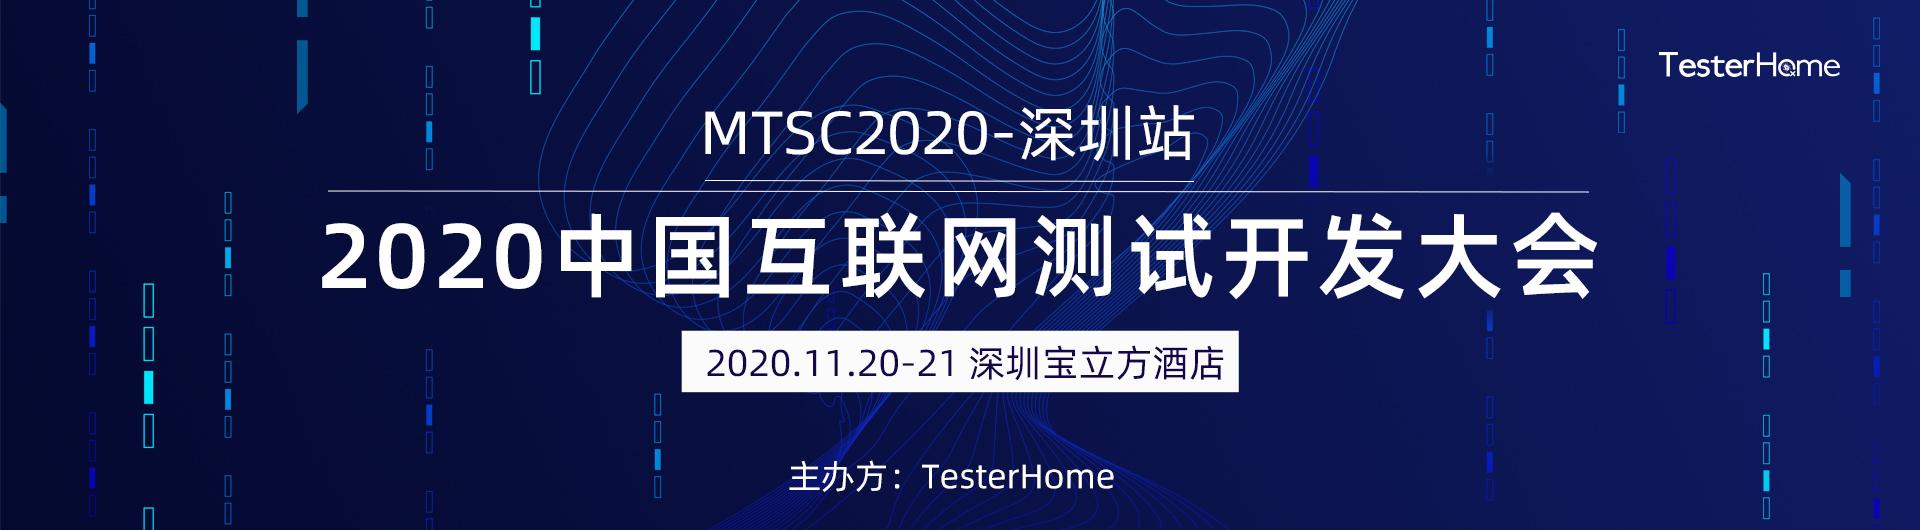 MTSC2020中国互联网测试开发大会 深圳站